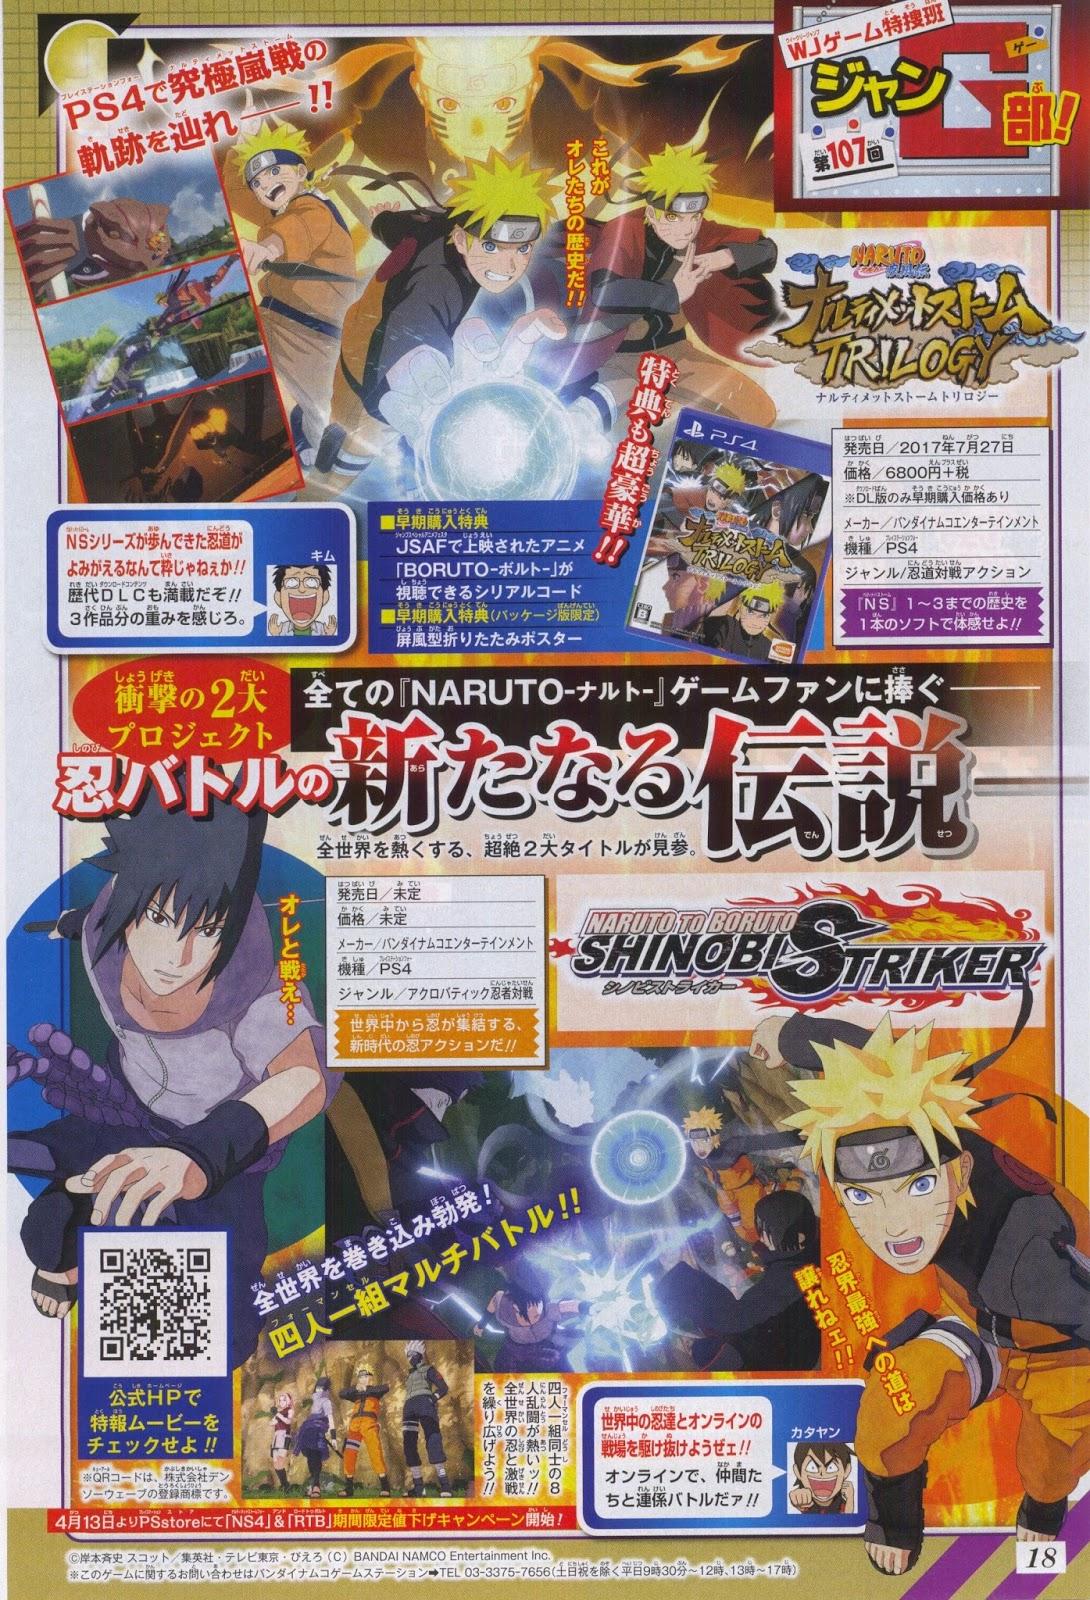 Se anuncian dos nuevos videojuegos de: Naruto to Boruto: Shinobi Striker y Ninja Storm: Trilogy